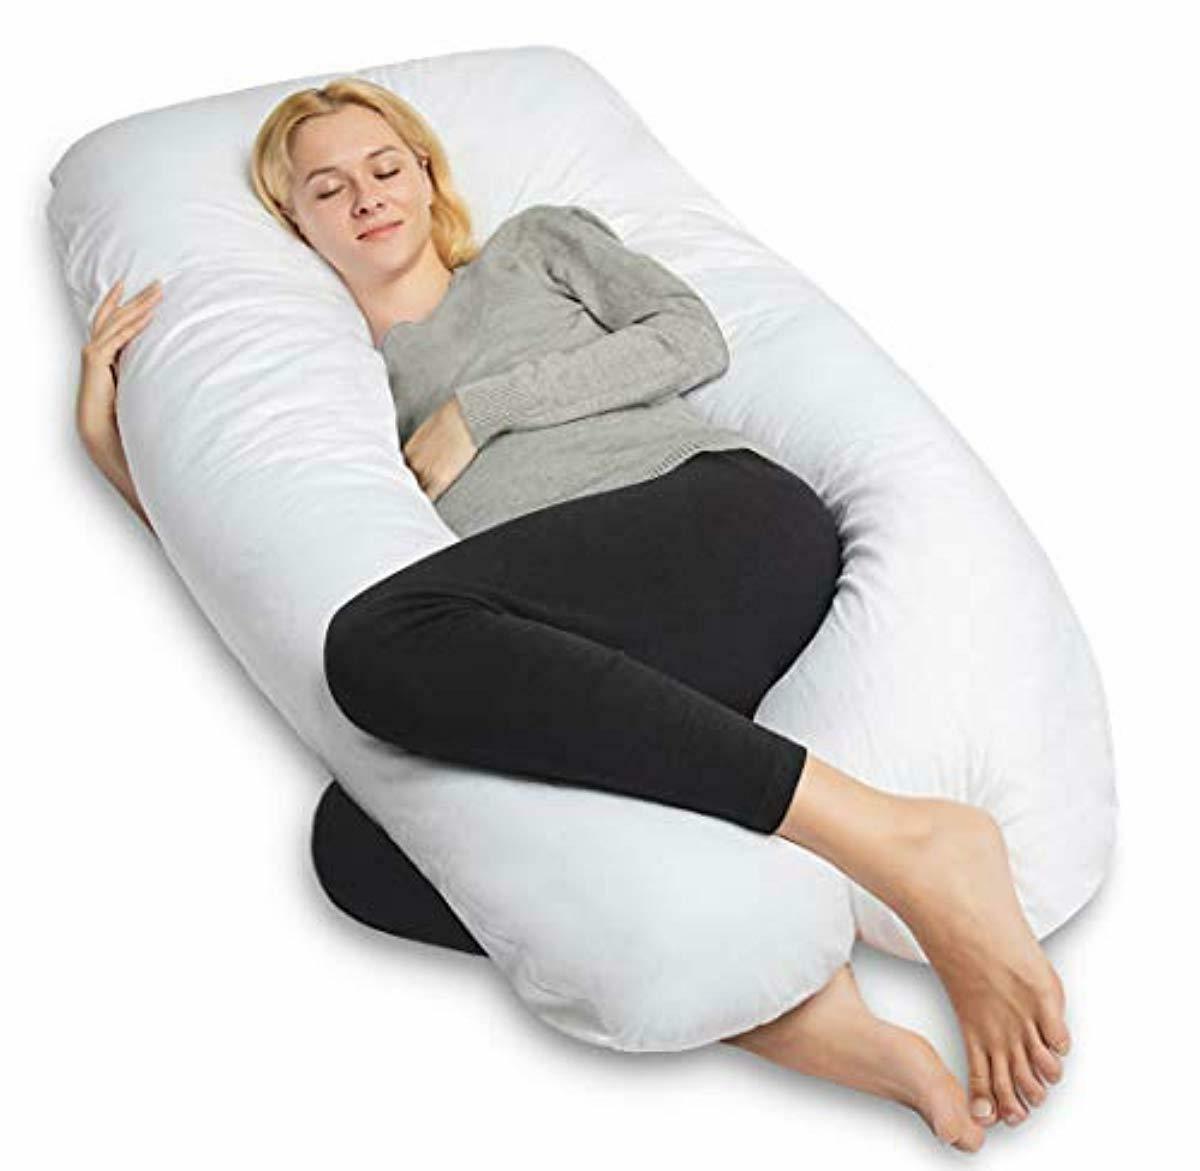 new pregnancy pillow u shaped full body